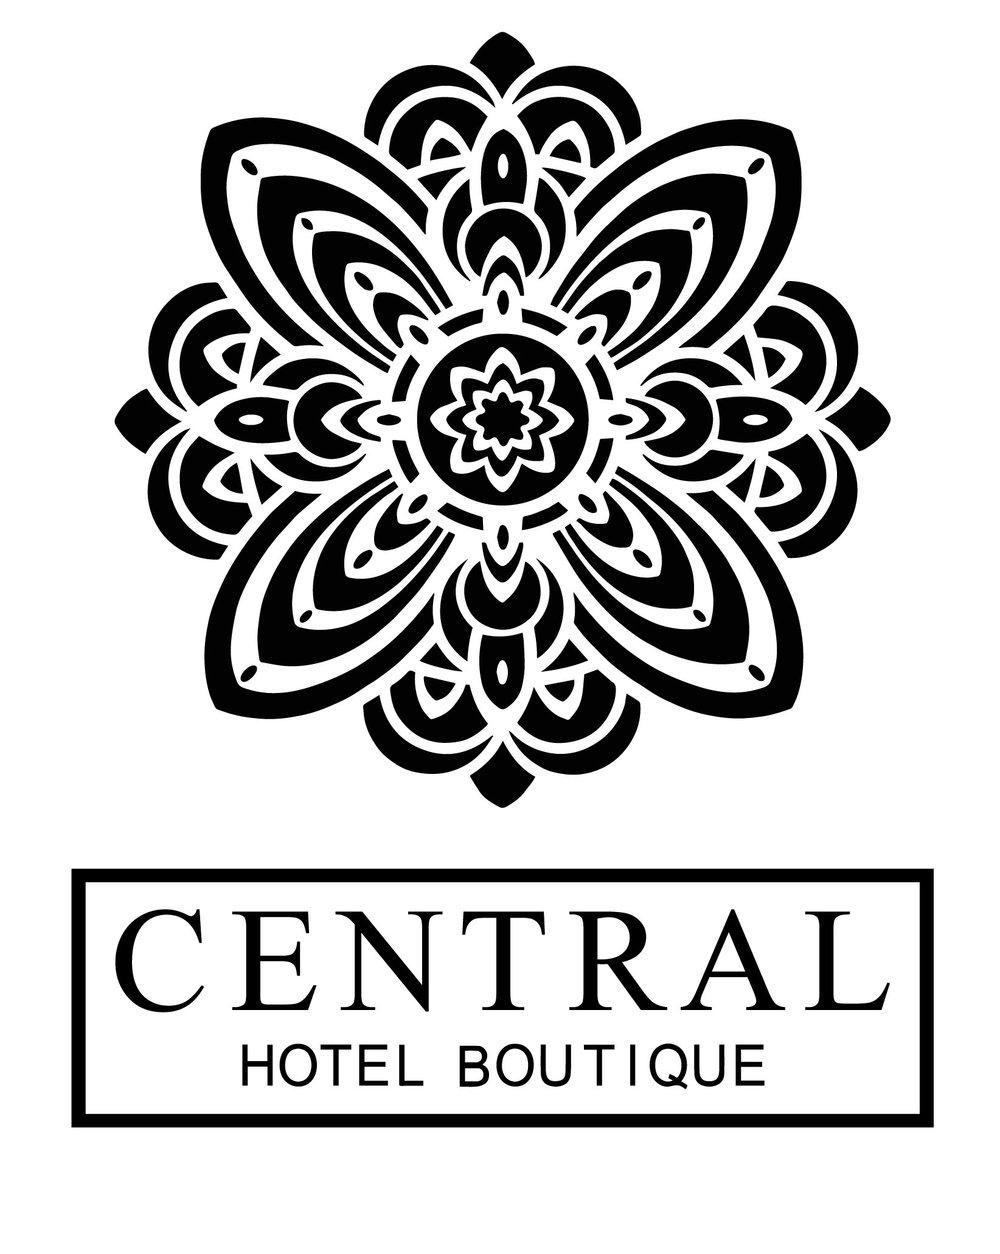 HOTEL CENTRAL BOUTIQUE NEGRO (PLACA EXTERIOR)-08-lr.jpg